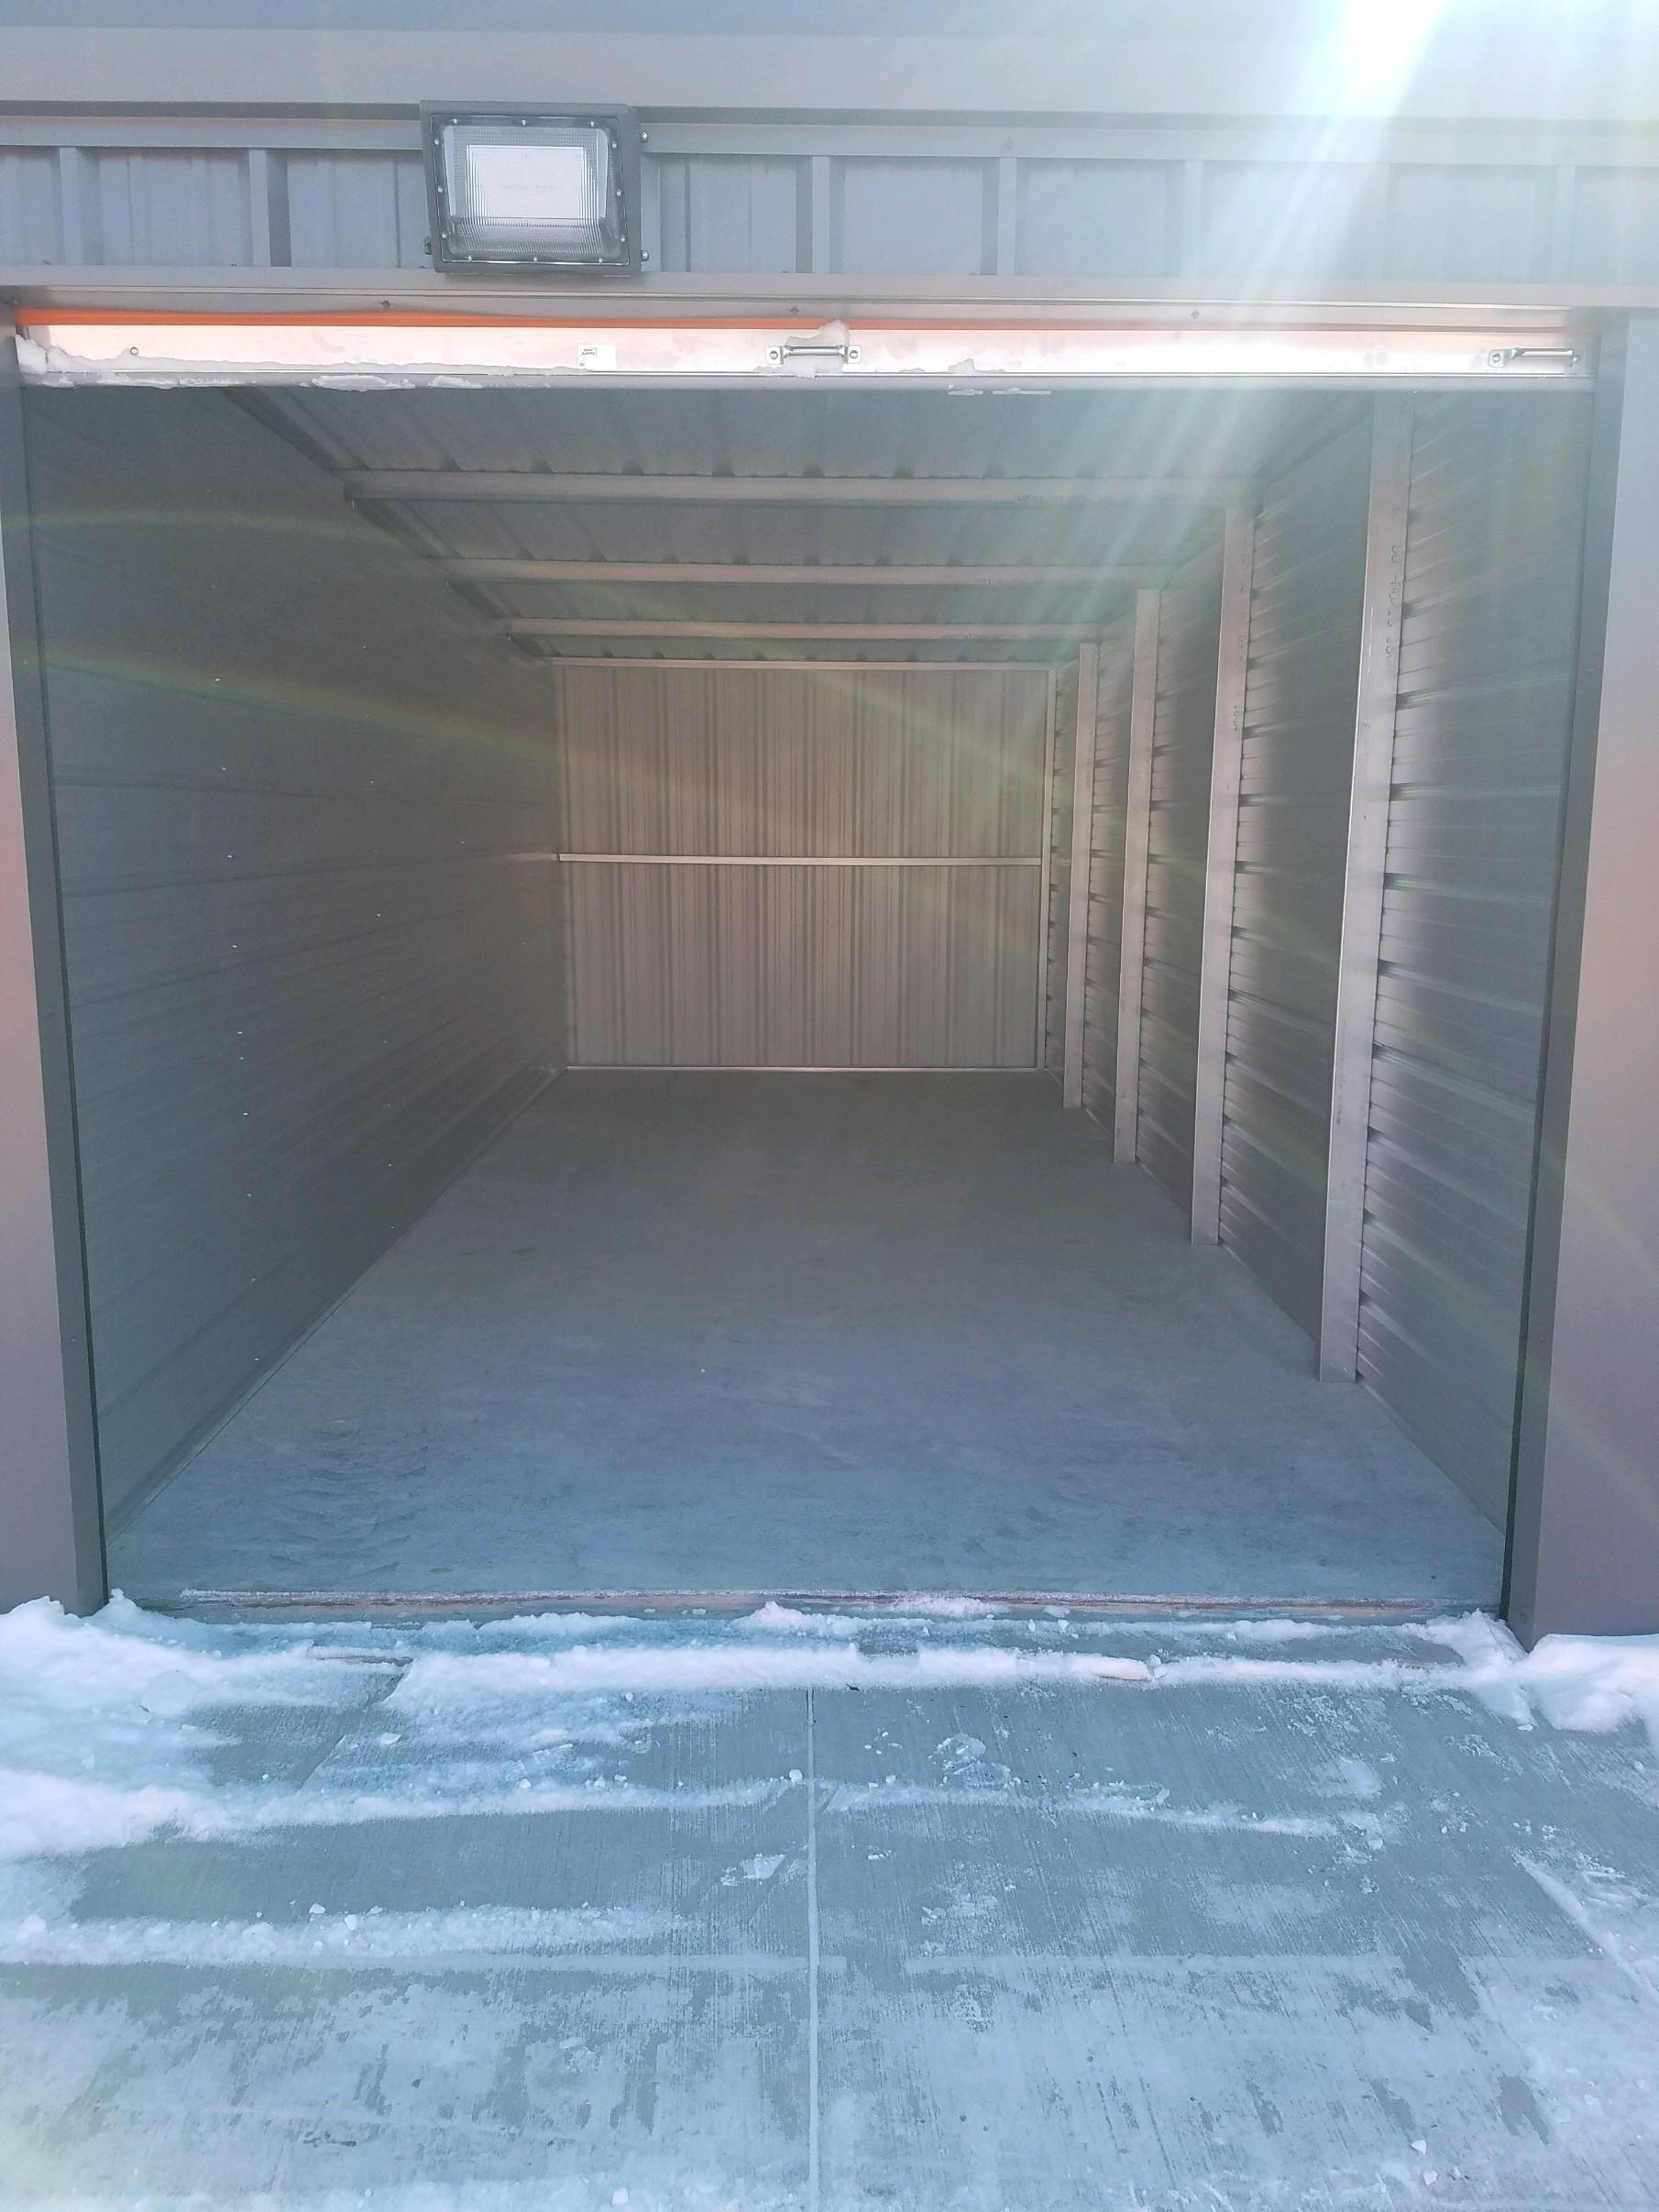 10' x 25' Self Storage Unit in Solon, Iowa at V' s Self Storage (full image)